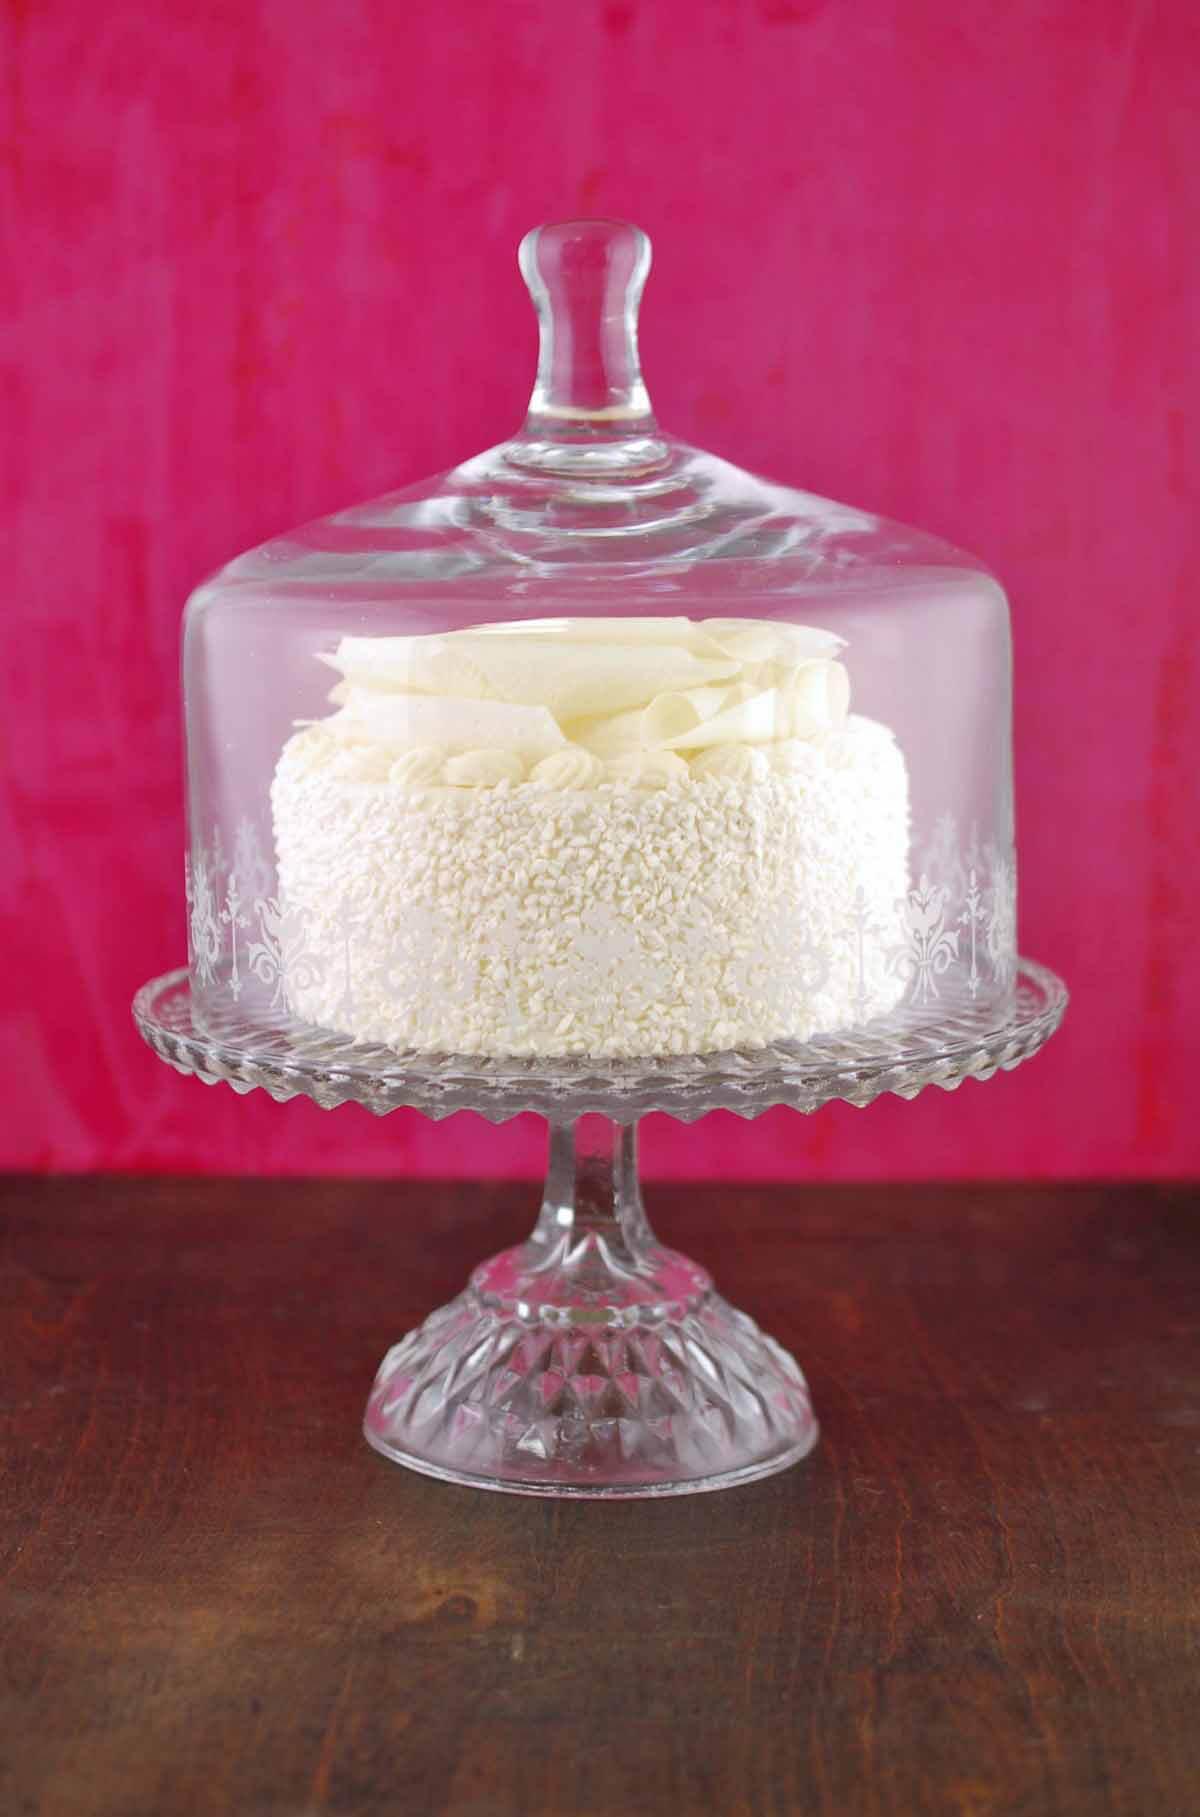 Glass Pedestal Vintage Cake Stand Set 11x9